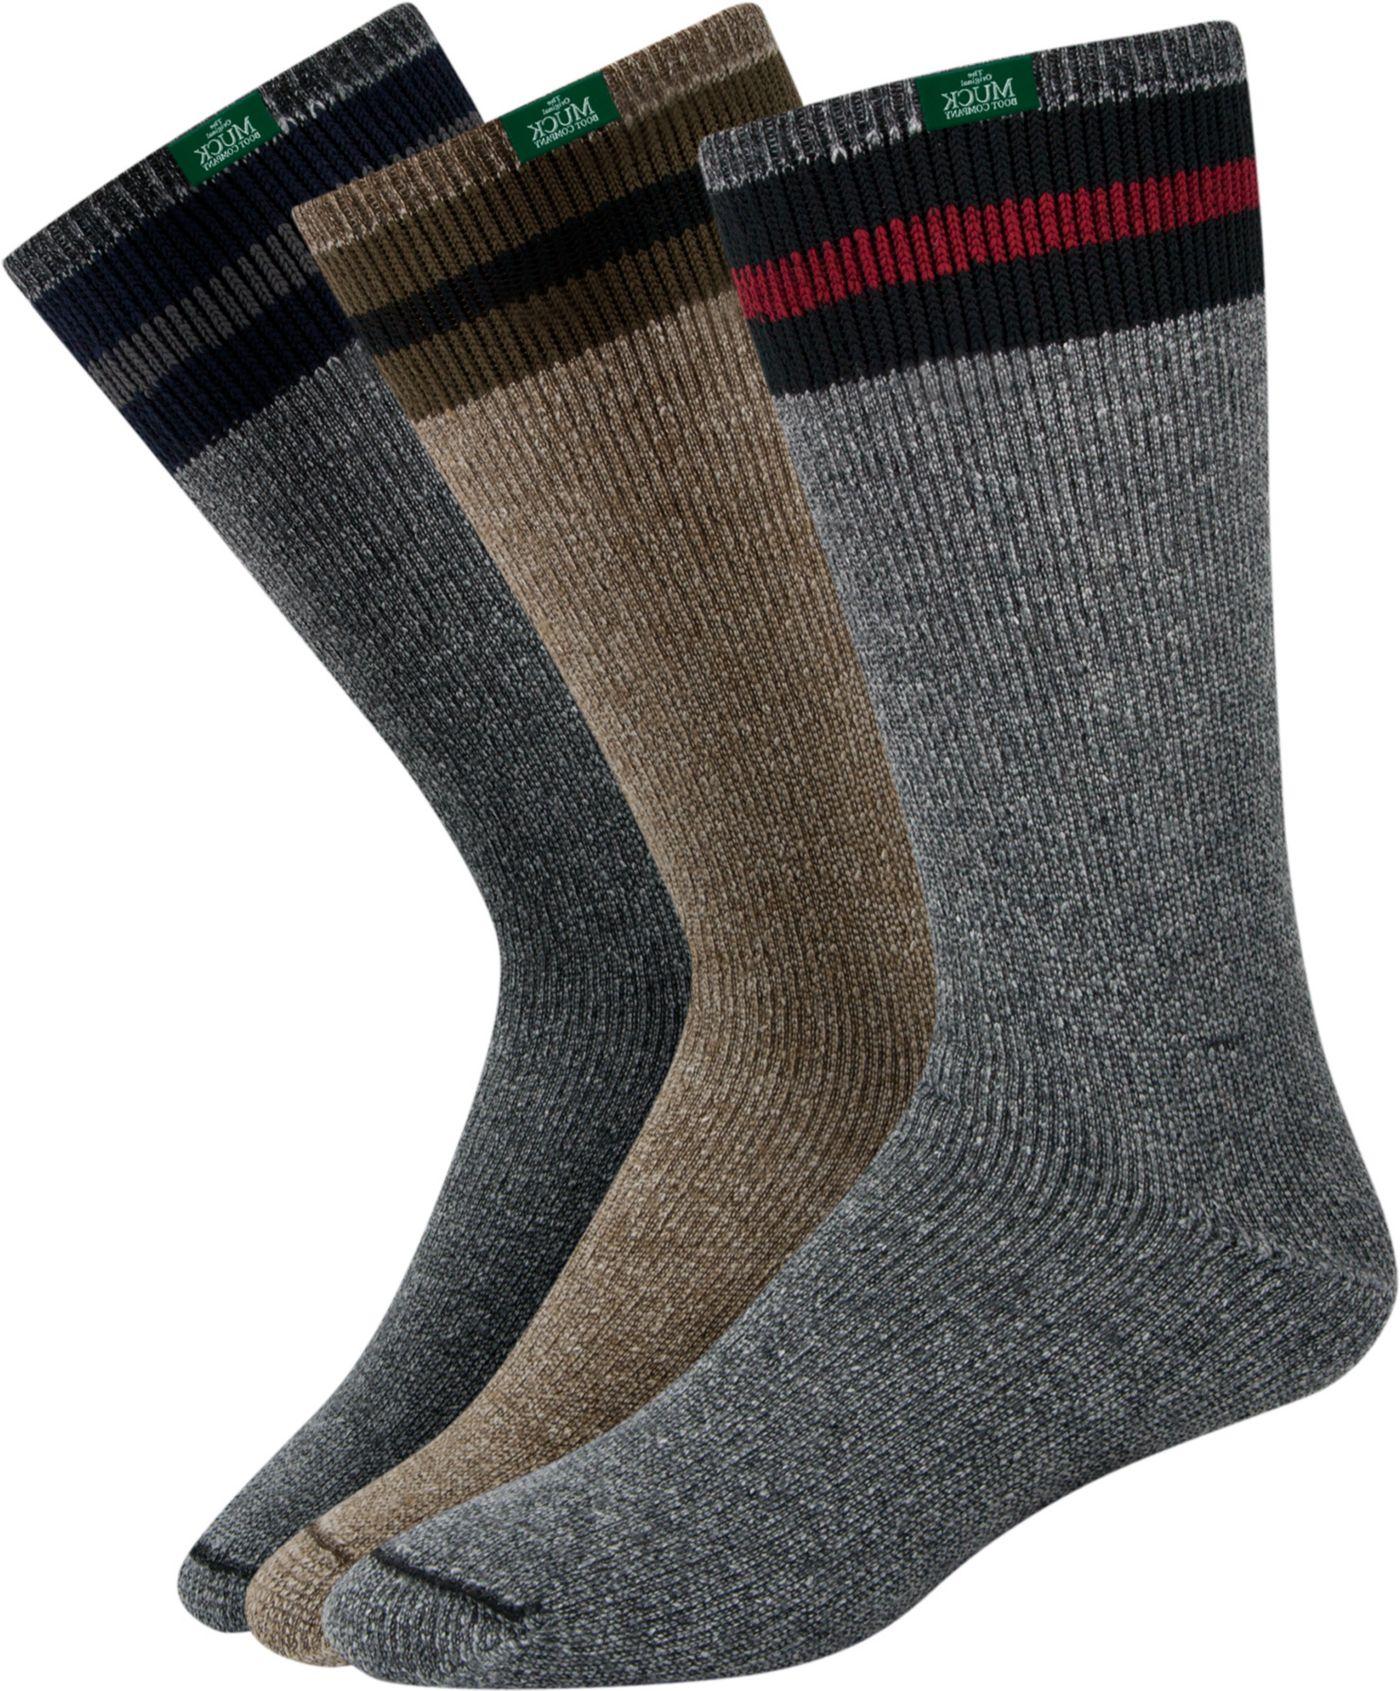 Muck's All American Wool Boot Socks - 3 Pack